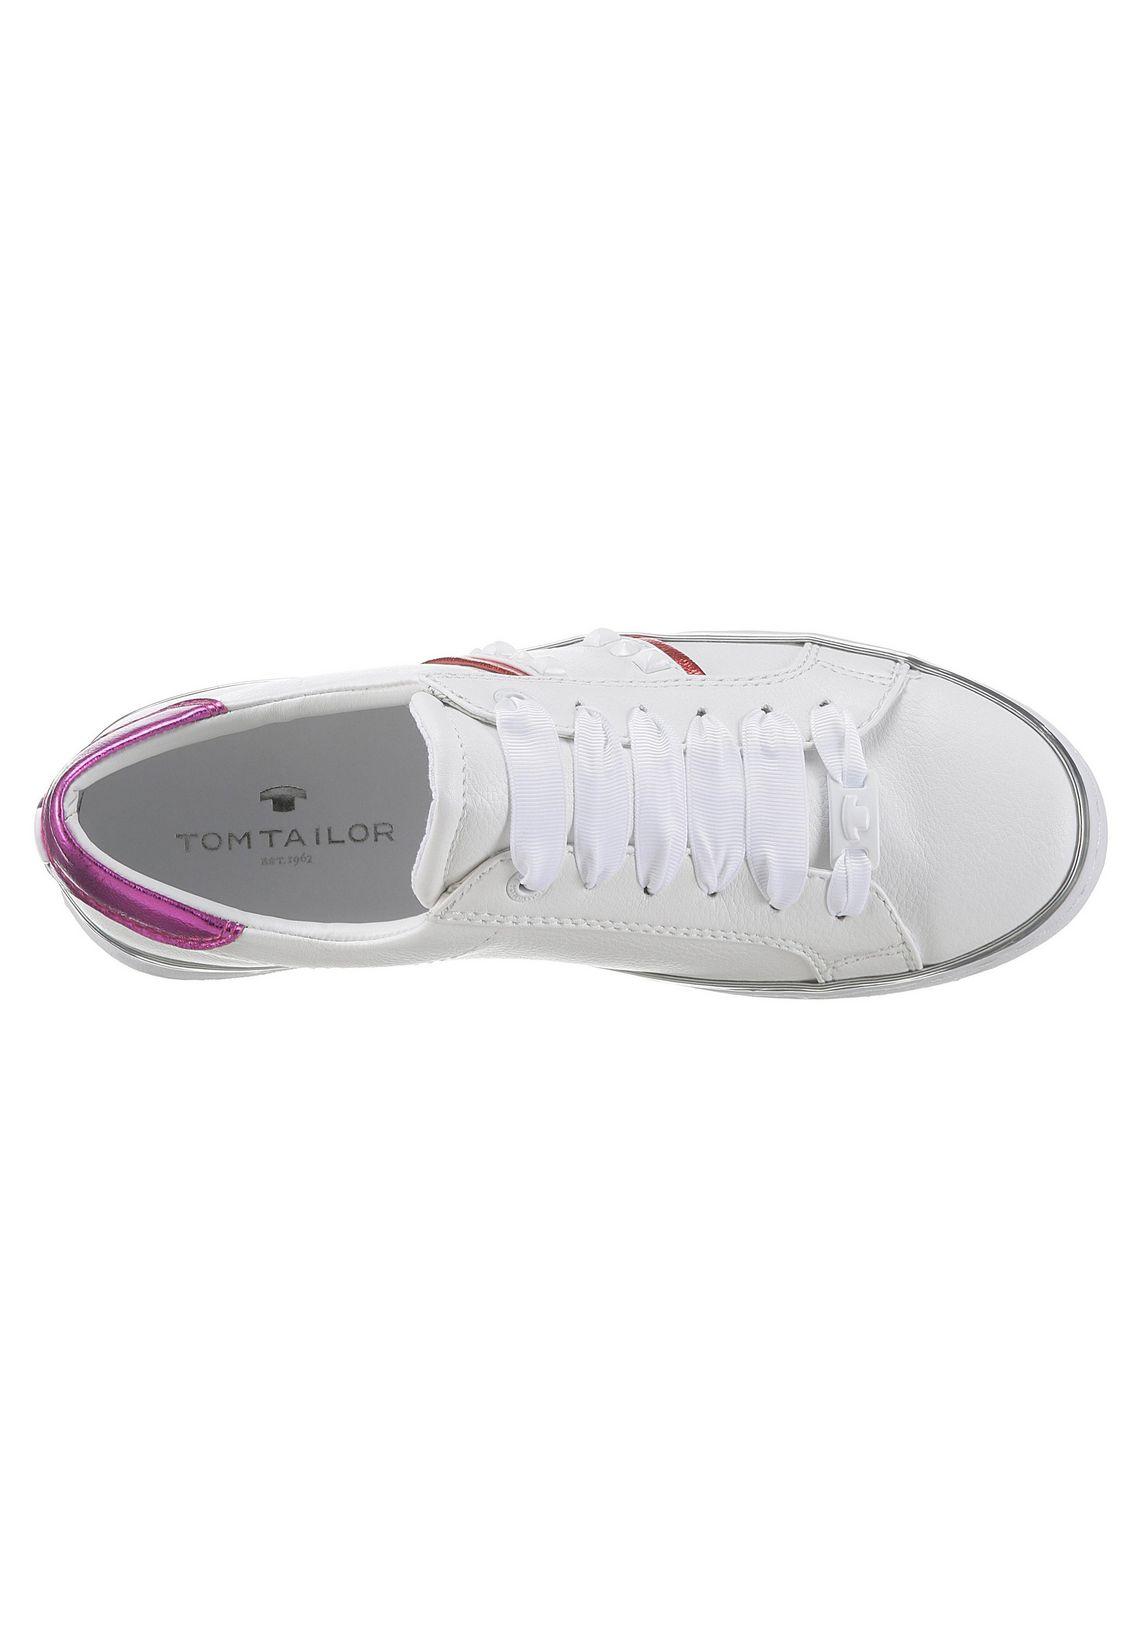 Tom Tailor sneakers vind je bij  wit/rood/pink